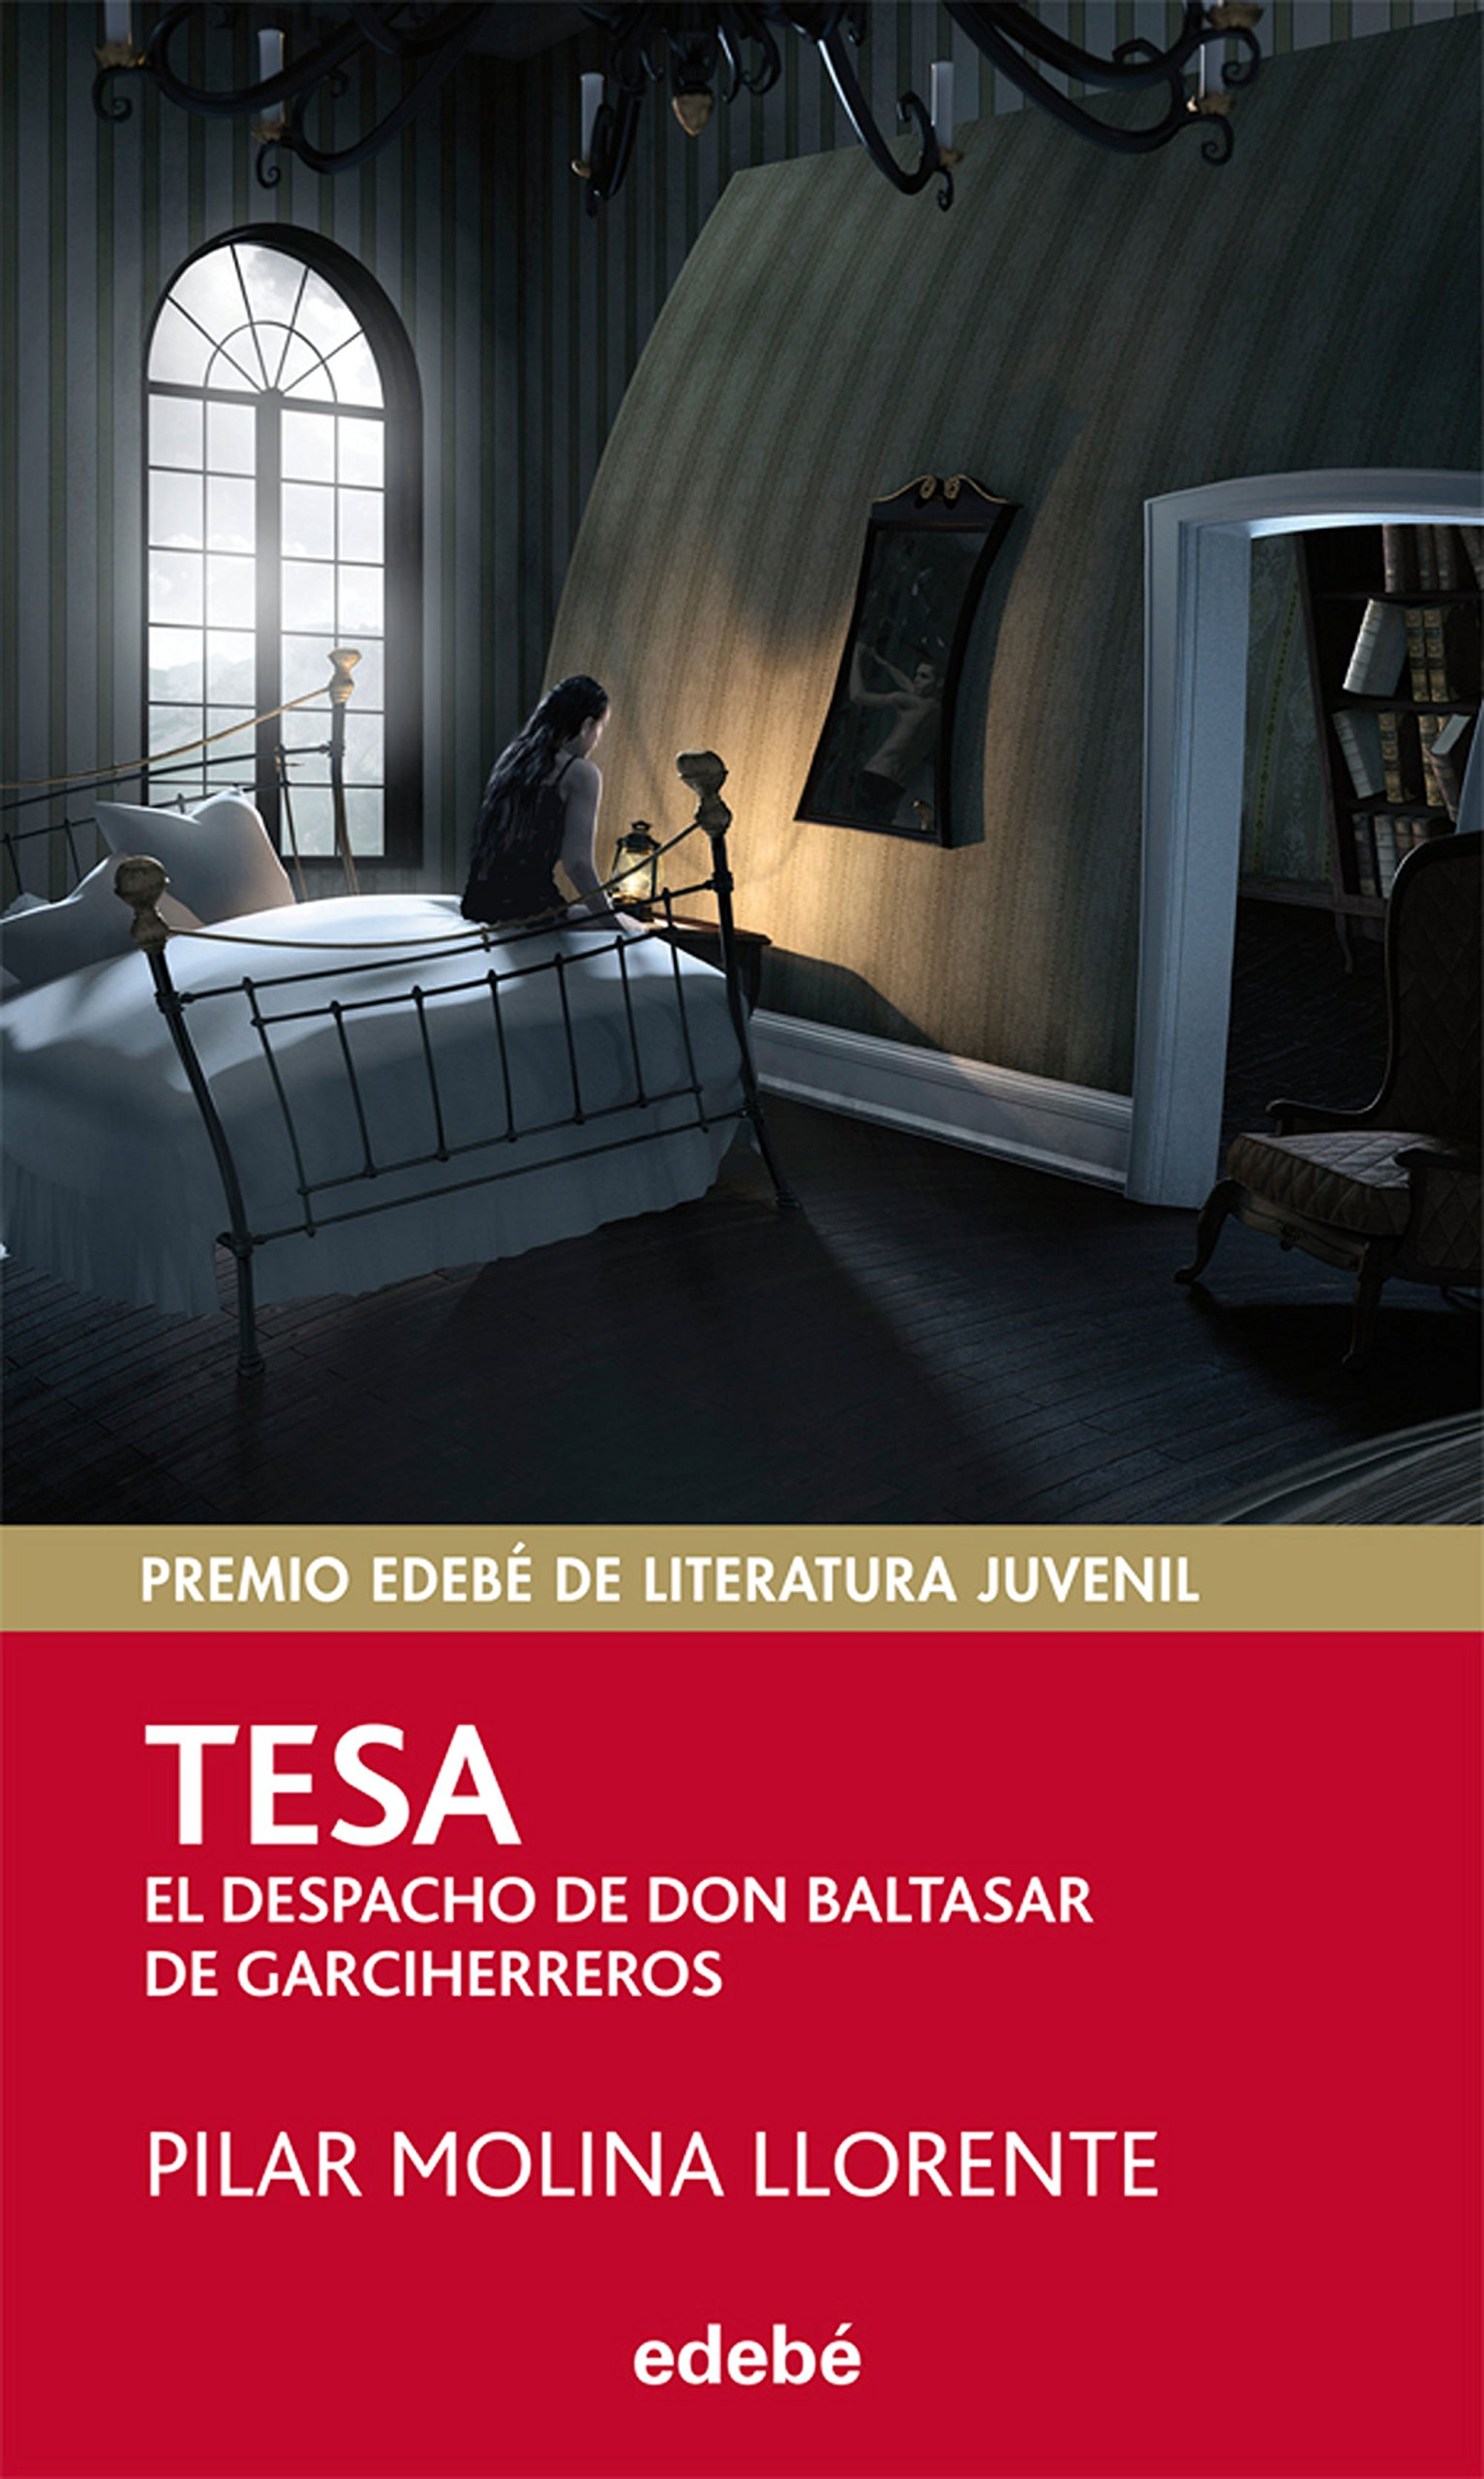 Premio EDEBÉ 2013 XXI edición JUVENIL: TESA-EL DESPACHO DE DON BALTASAR DE GARCIHERREROS Periscopio: Amazon.es: Pilar Molina LLorente: Libros